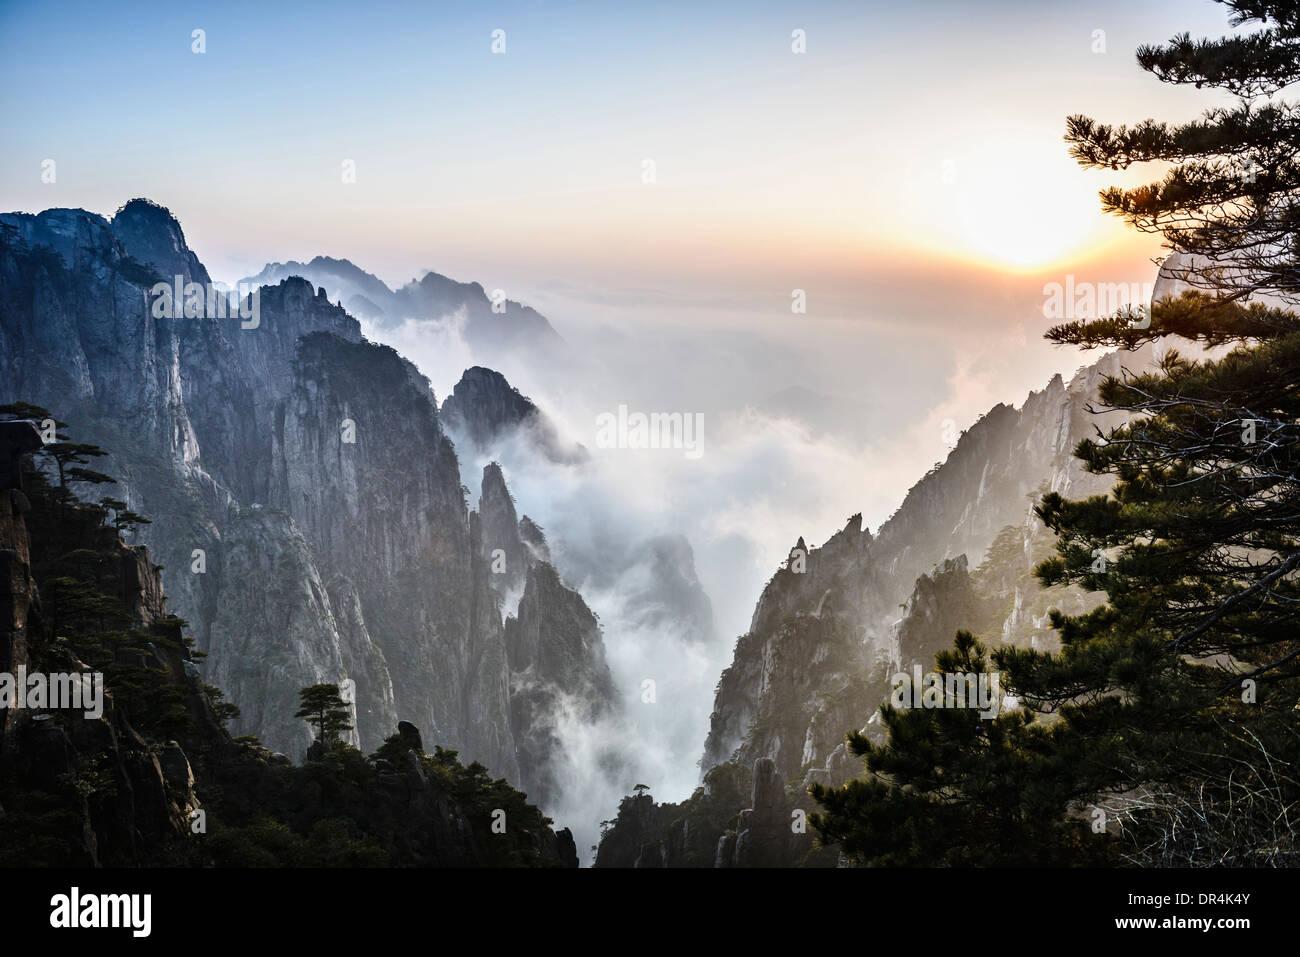 Nebel überrollen Felsengebirge, Huangshan, Anhui, China Stockbild